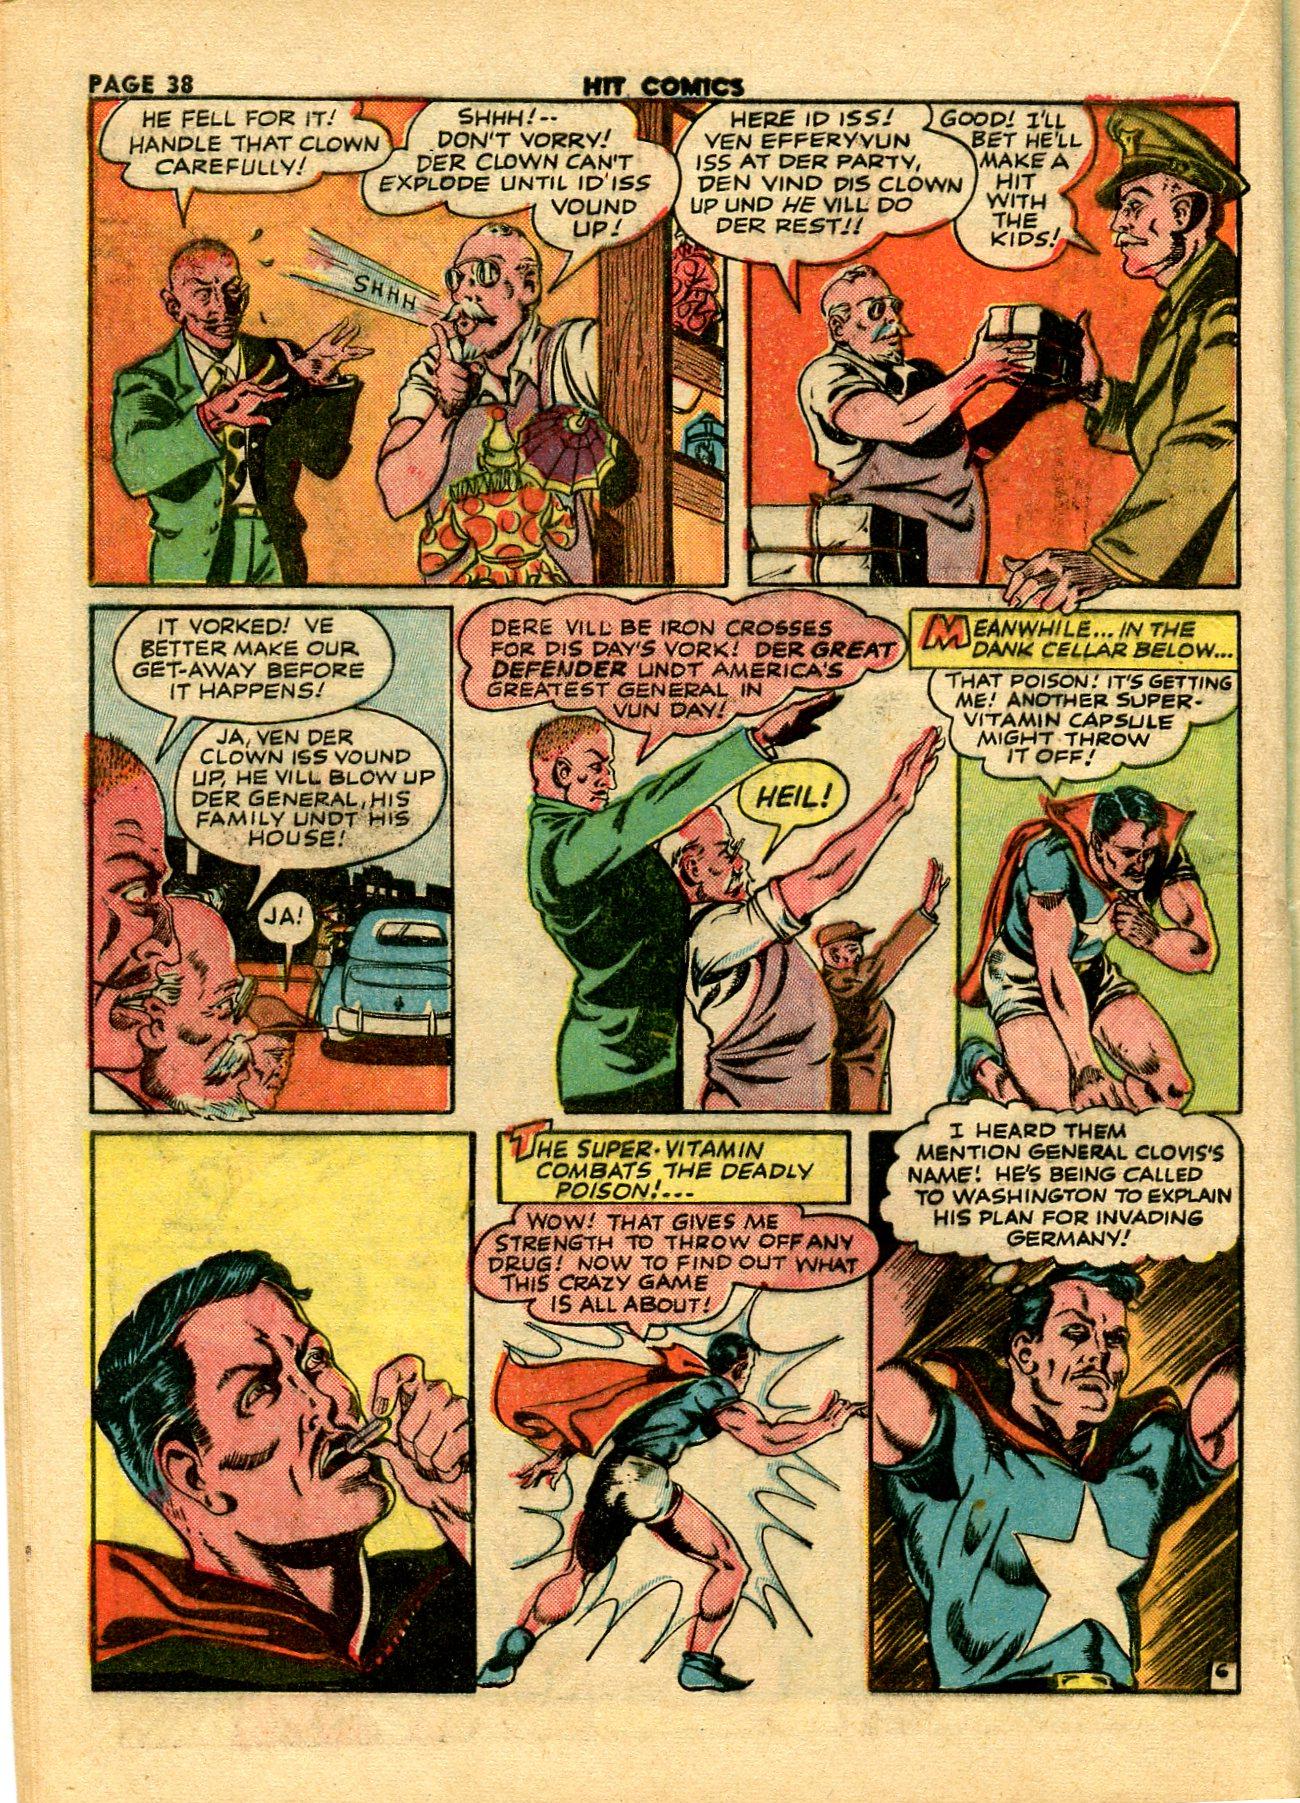 Read online Hit Comics comic -  Issue #28 - 41